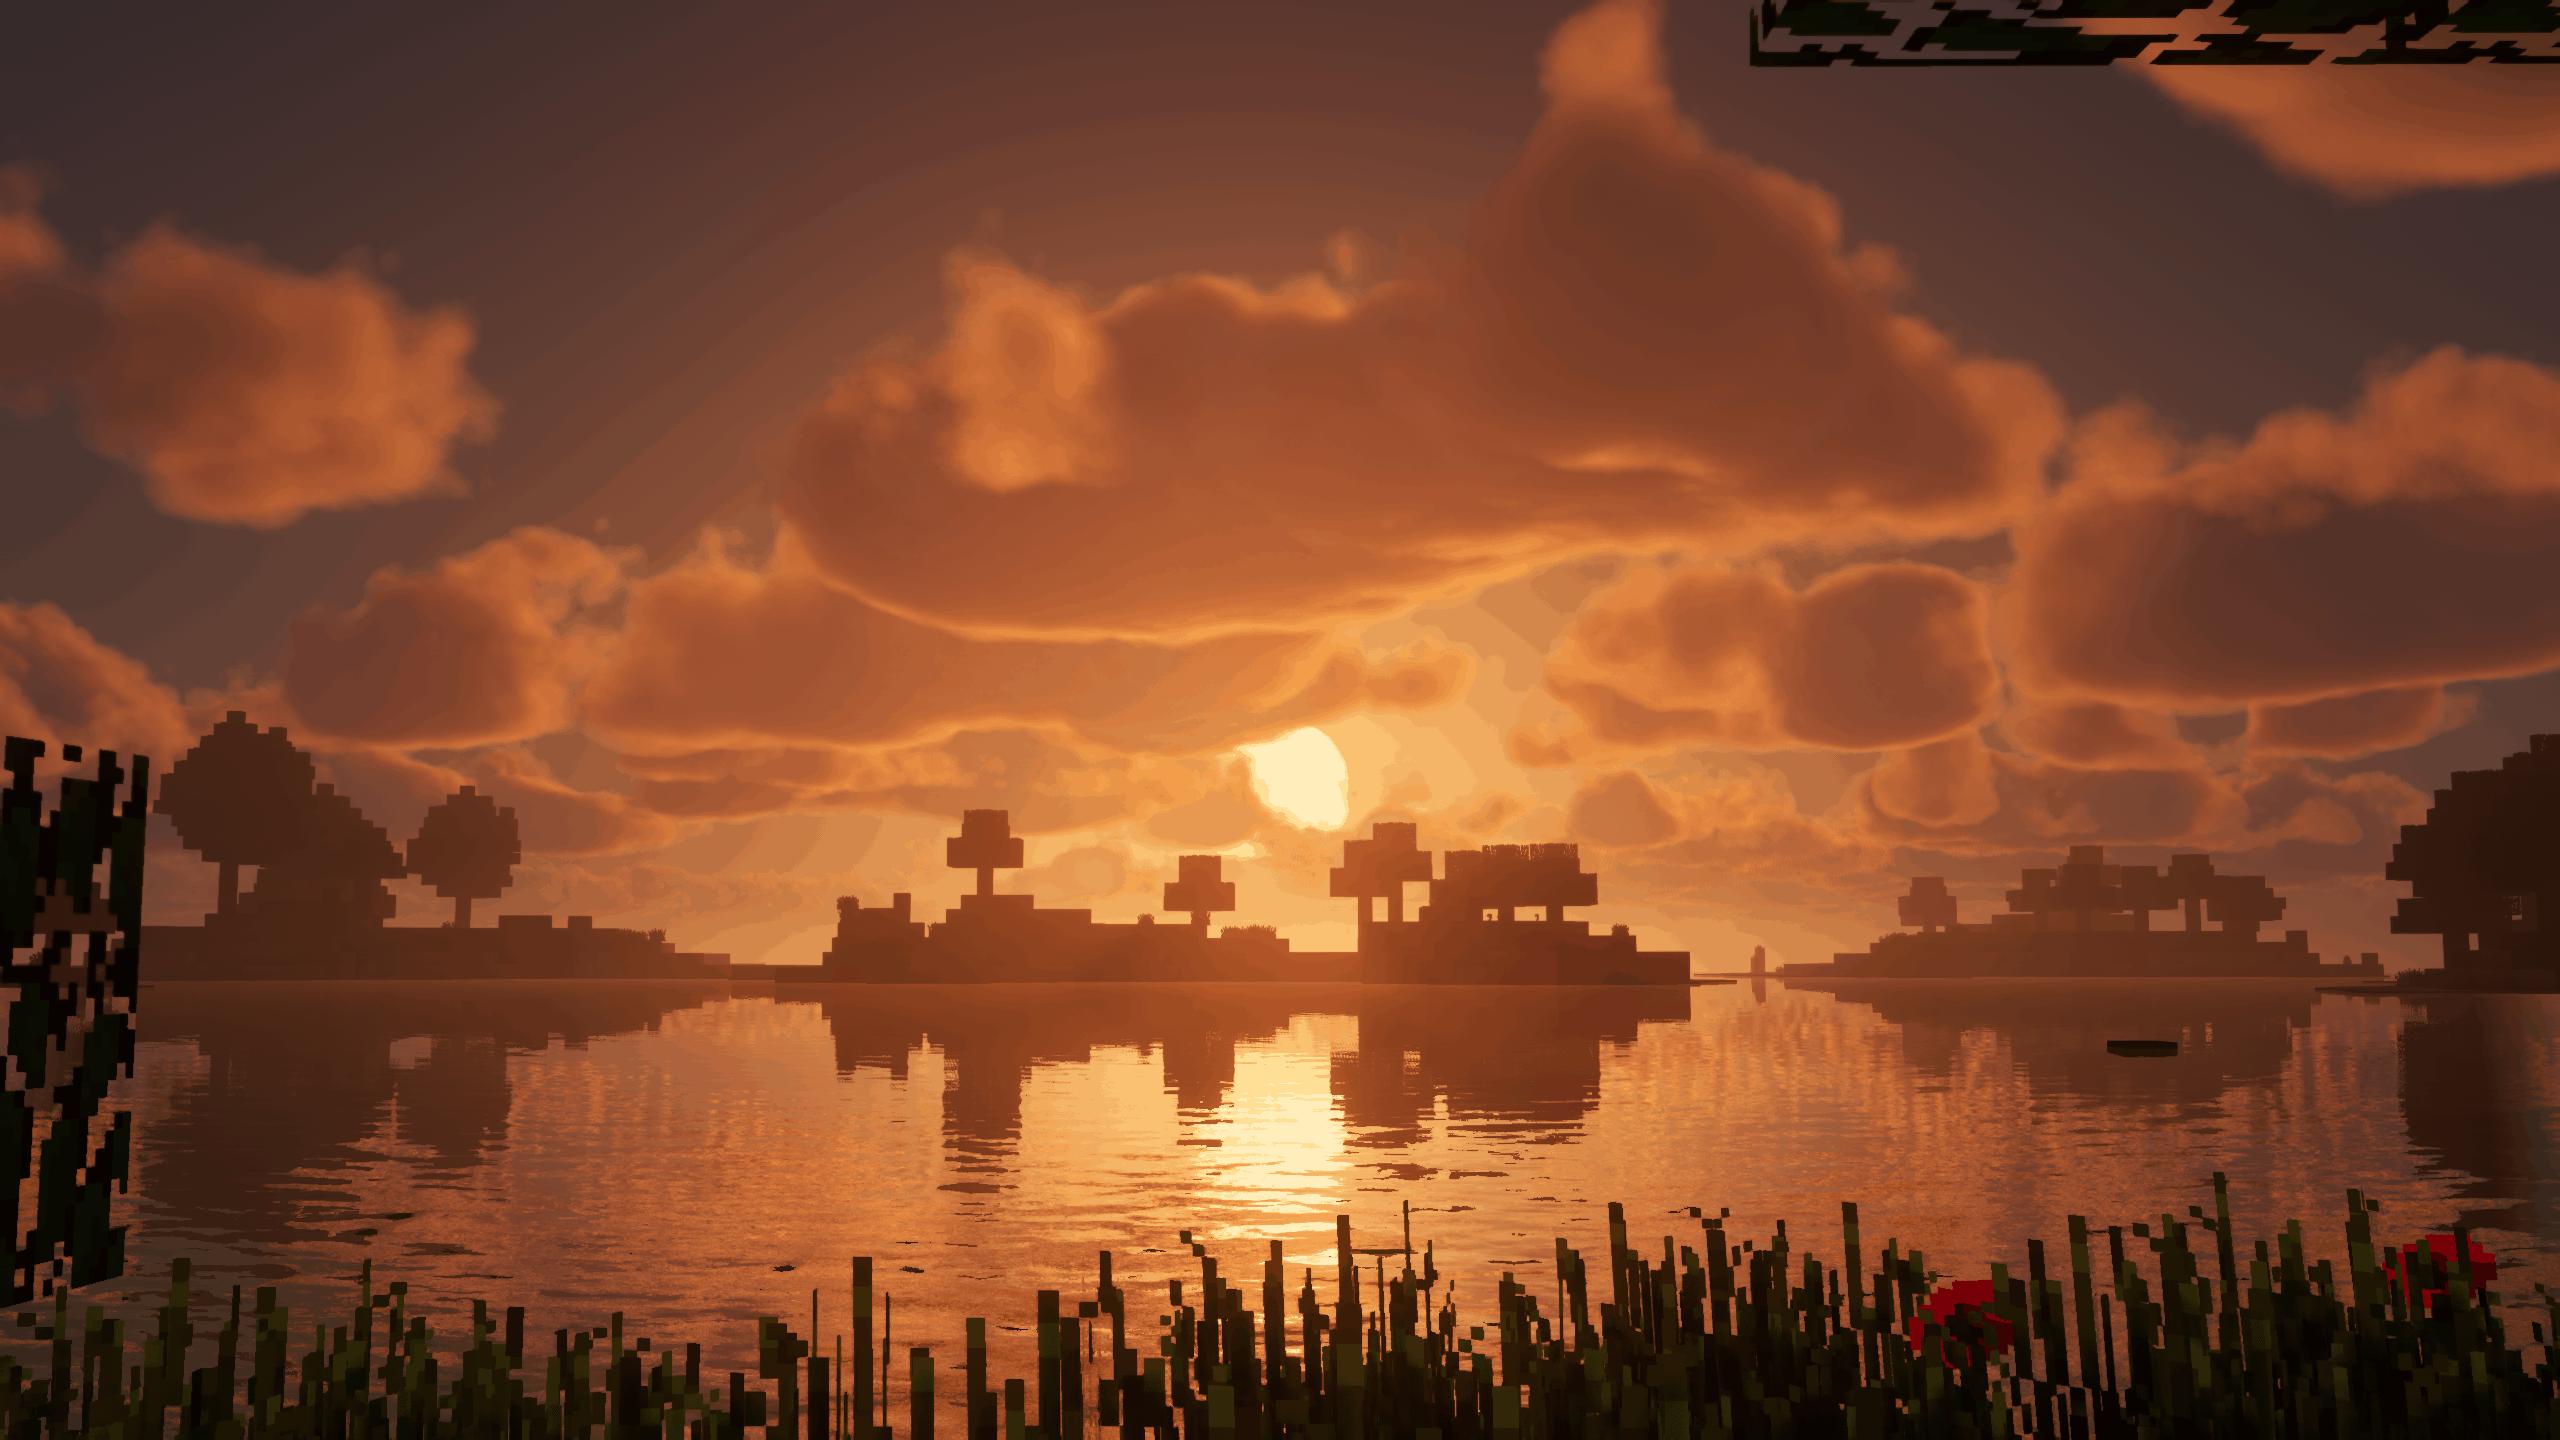 Coucher de soleil dans Minecraft